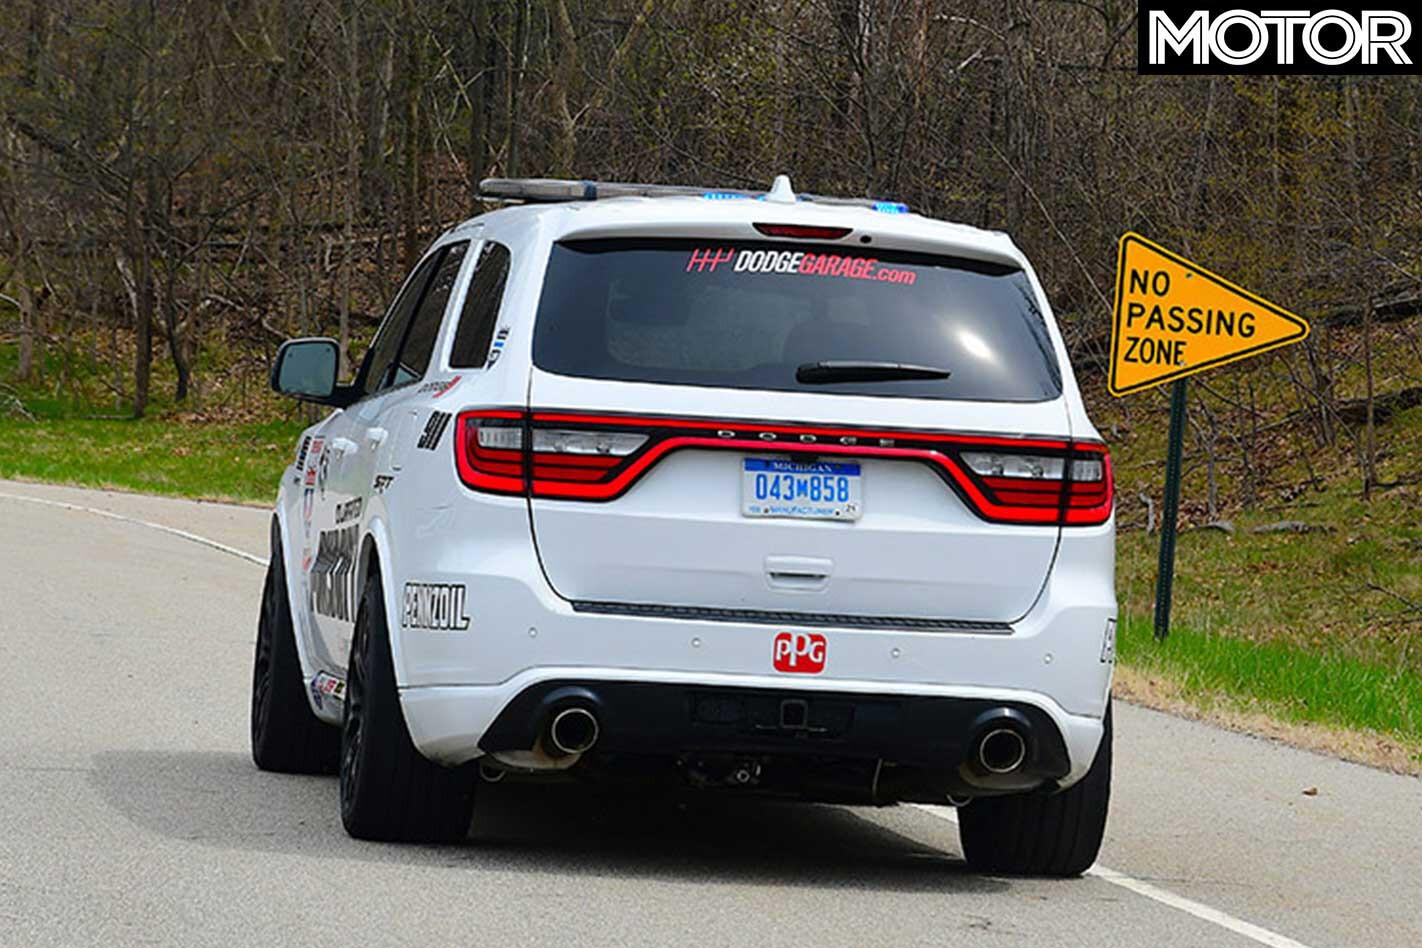 Durango Pursuit Speed Trap Lap Of America Rear Jpg